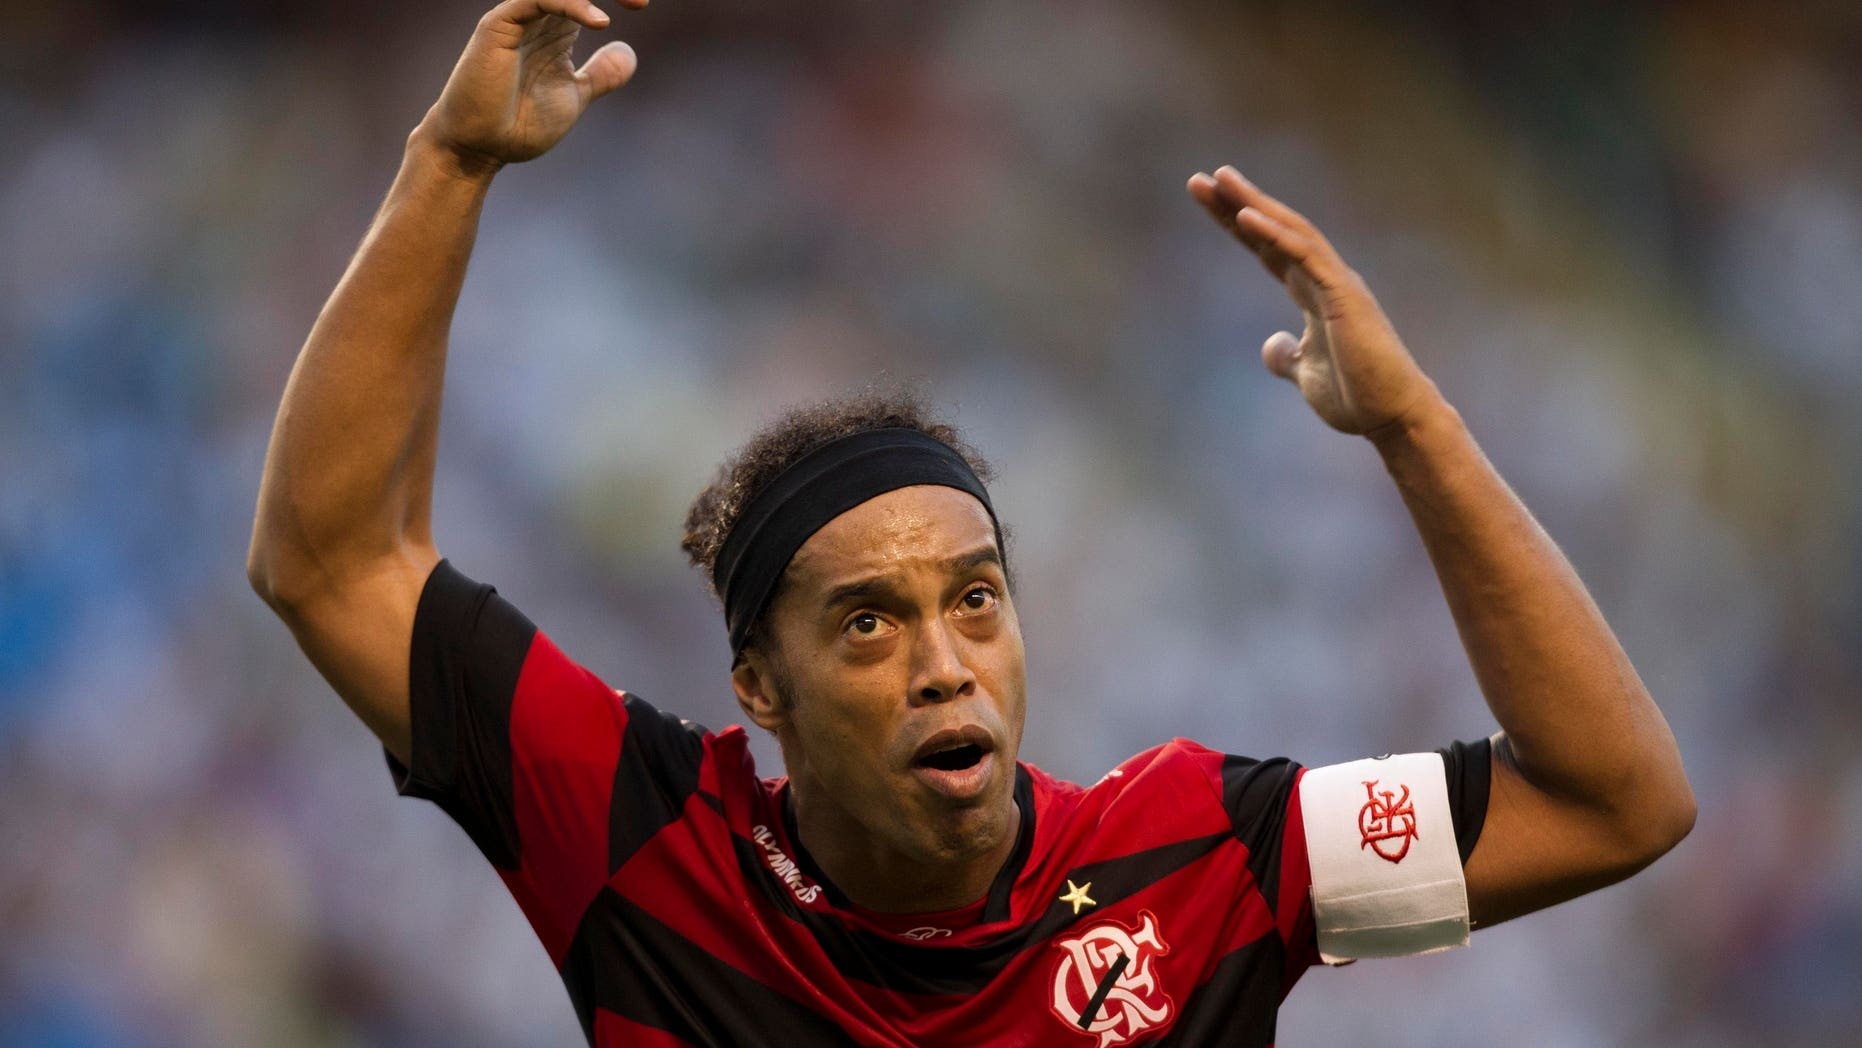 Flamengo's Ronaldinho reacts during a Brazilian soccer league match against Vasco da Gama in Rio de Janeiro, Brazil, Sunday, Aug.  28, 2011. The match ended 0-0. (AP Photo/Felipe Dana)